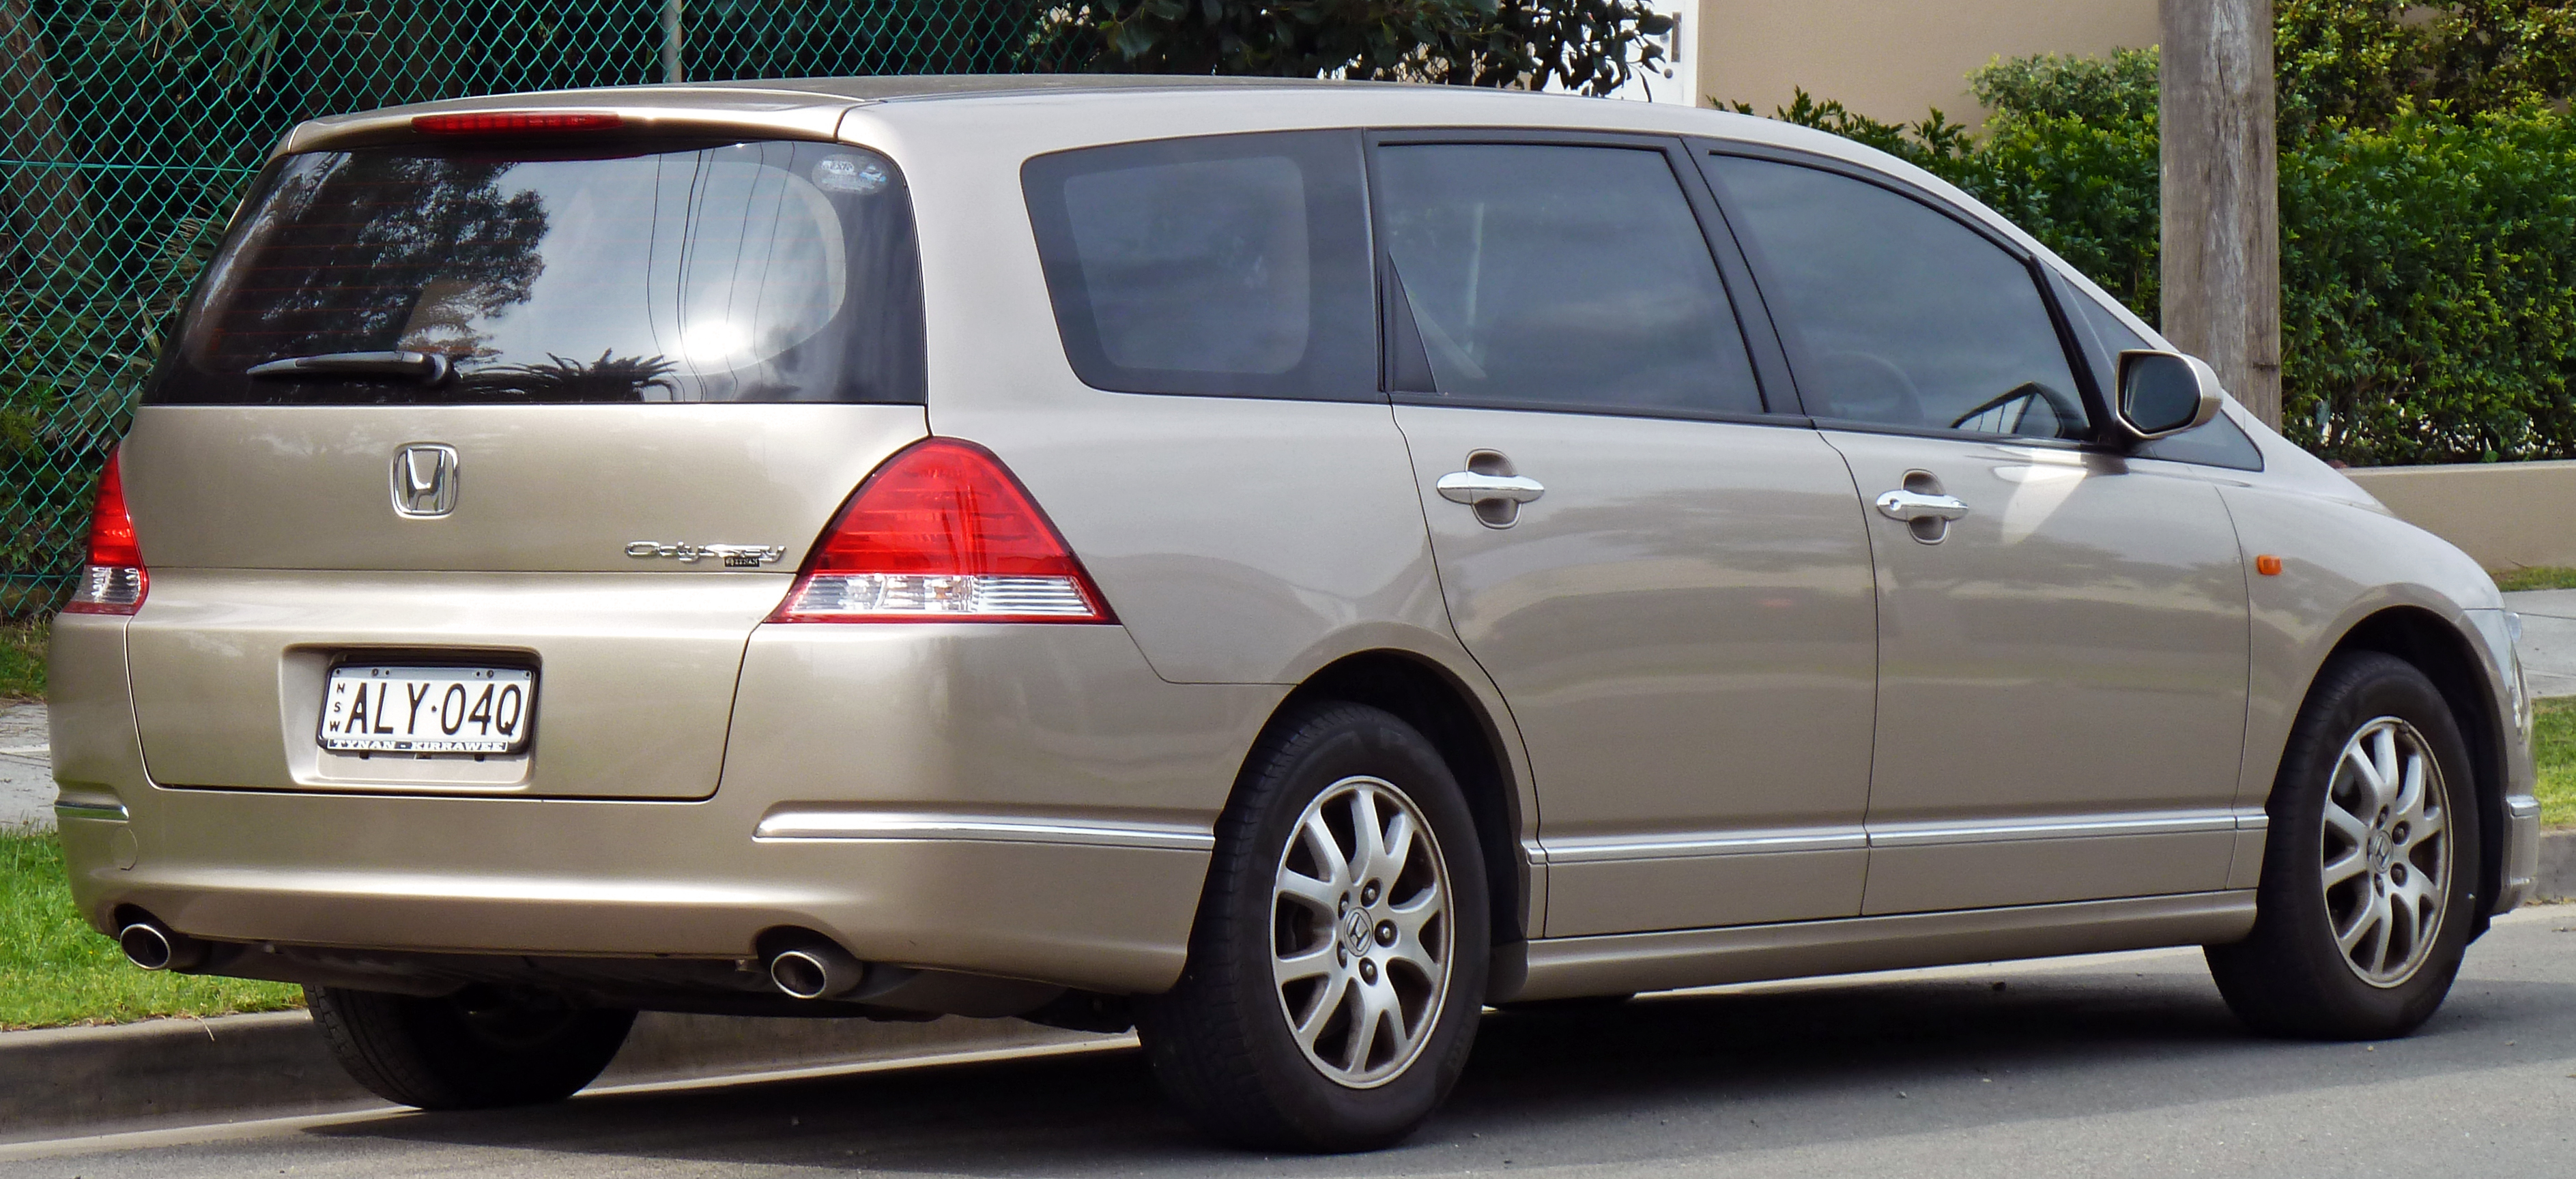 minivan odyssey honda carsguide